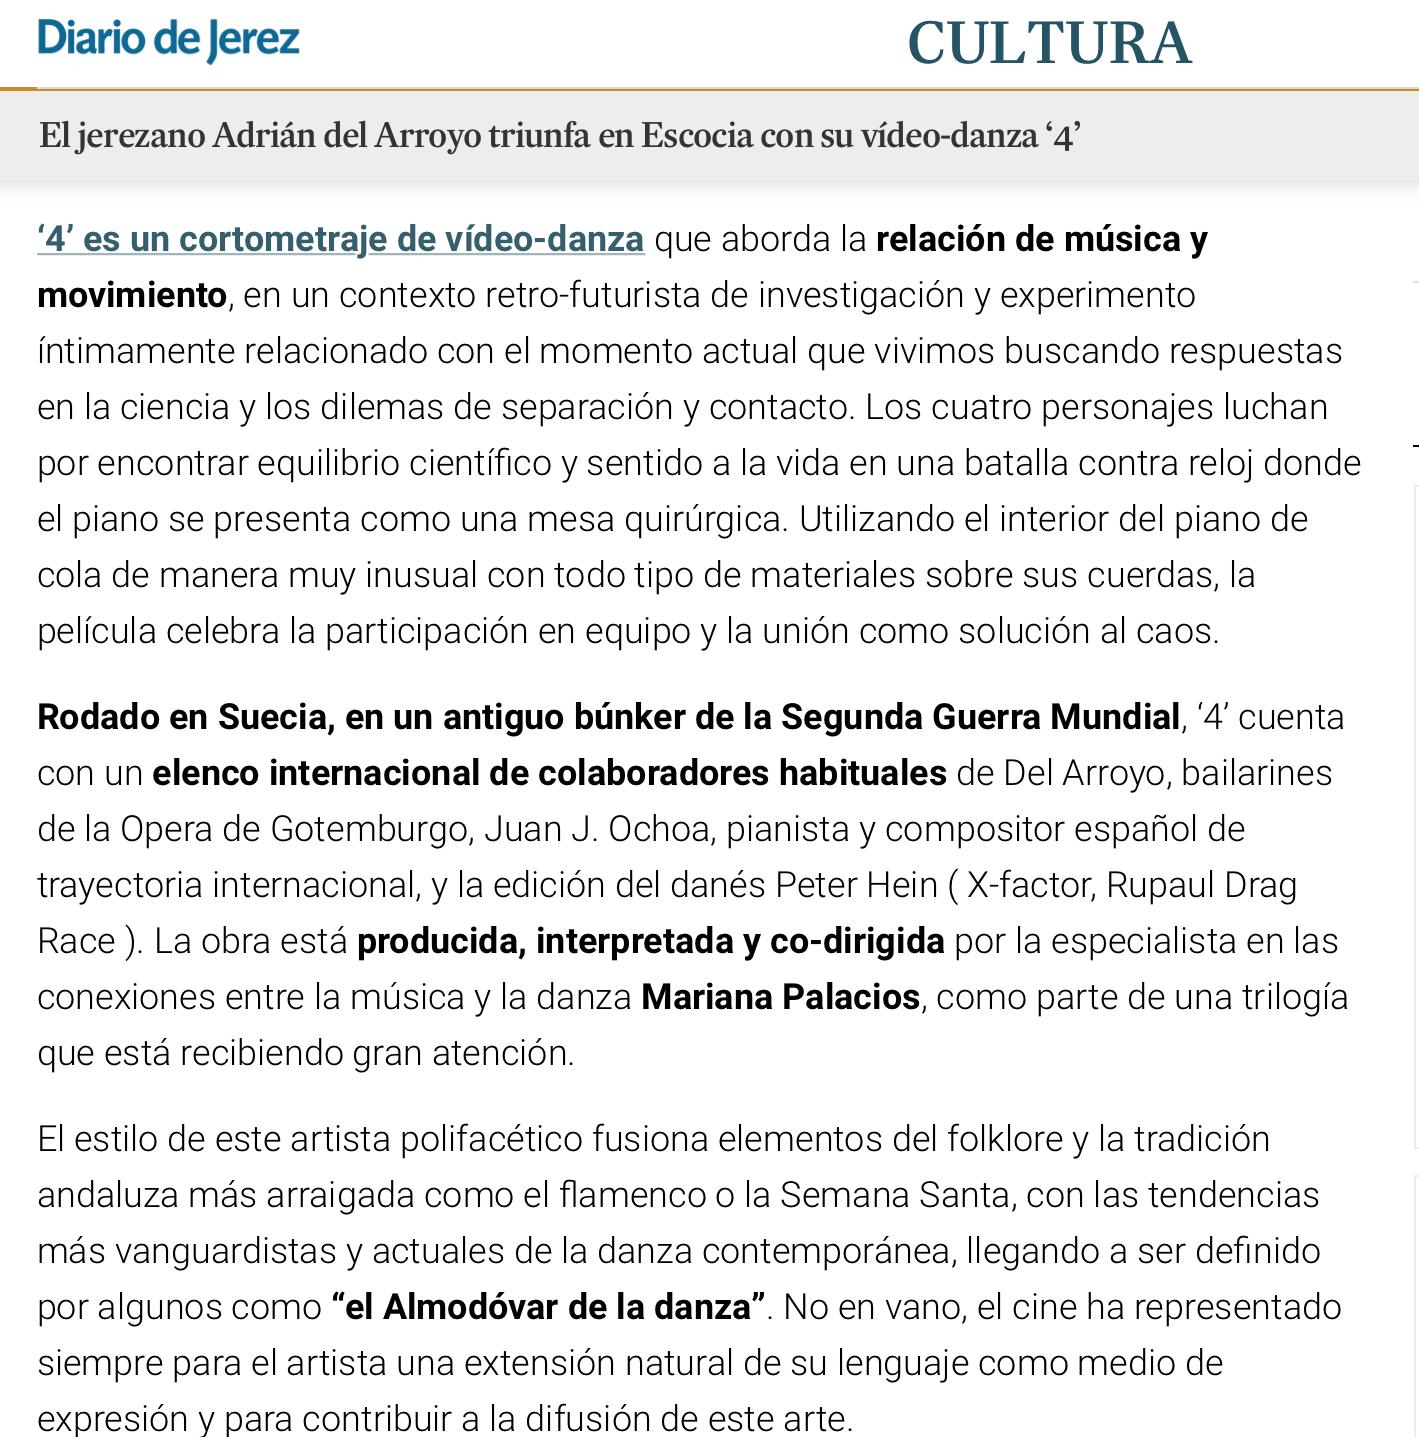 Diario de Jerez 3 Screenshot 2021-05-02 at 20.14.50